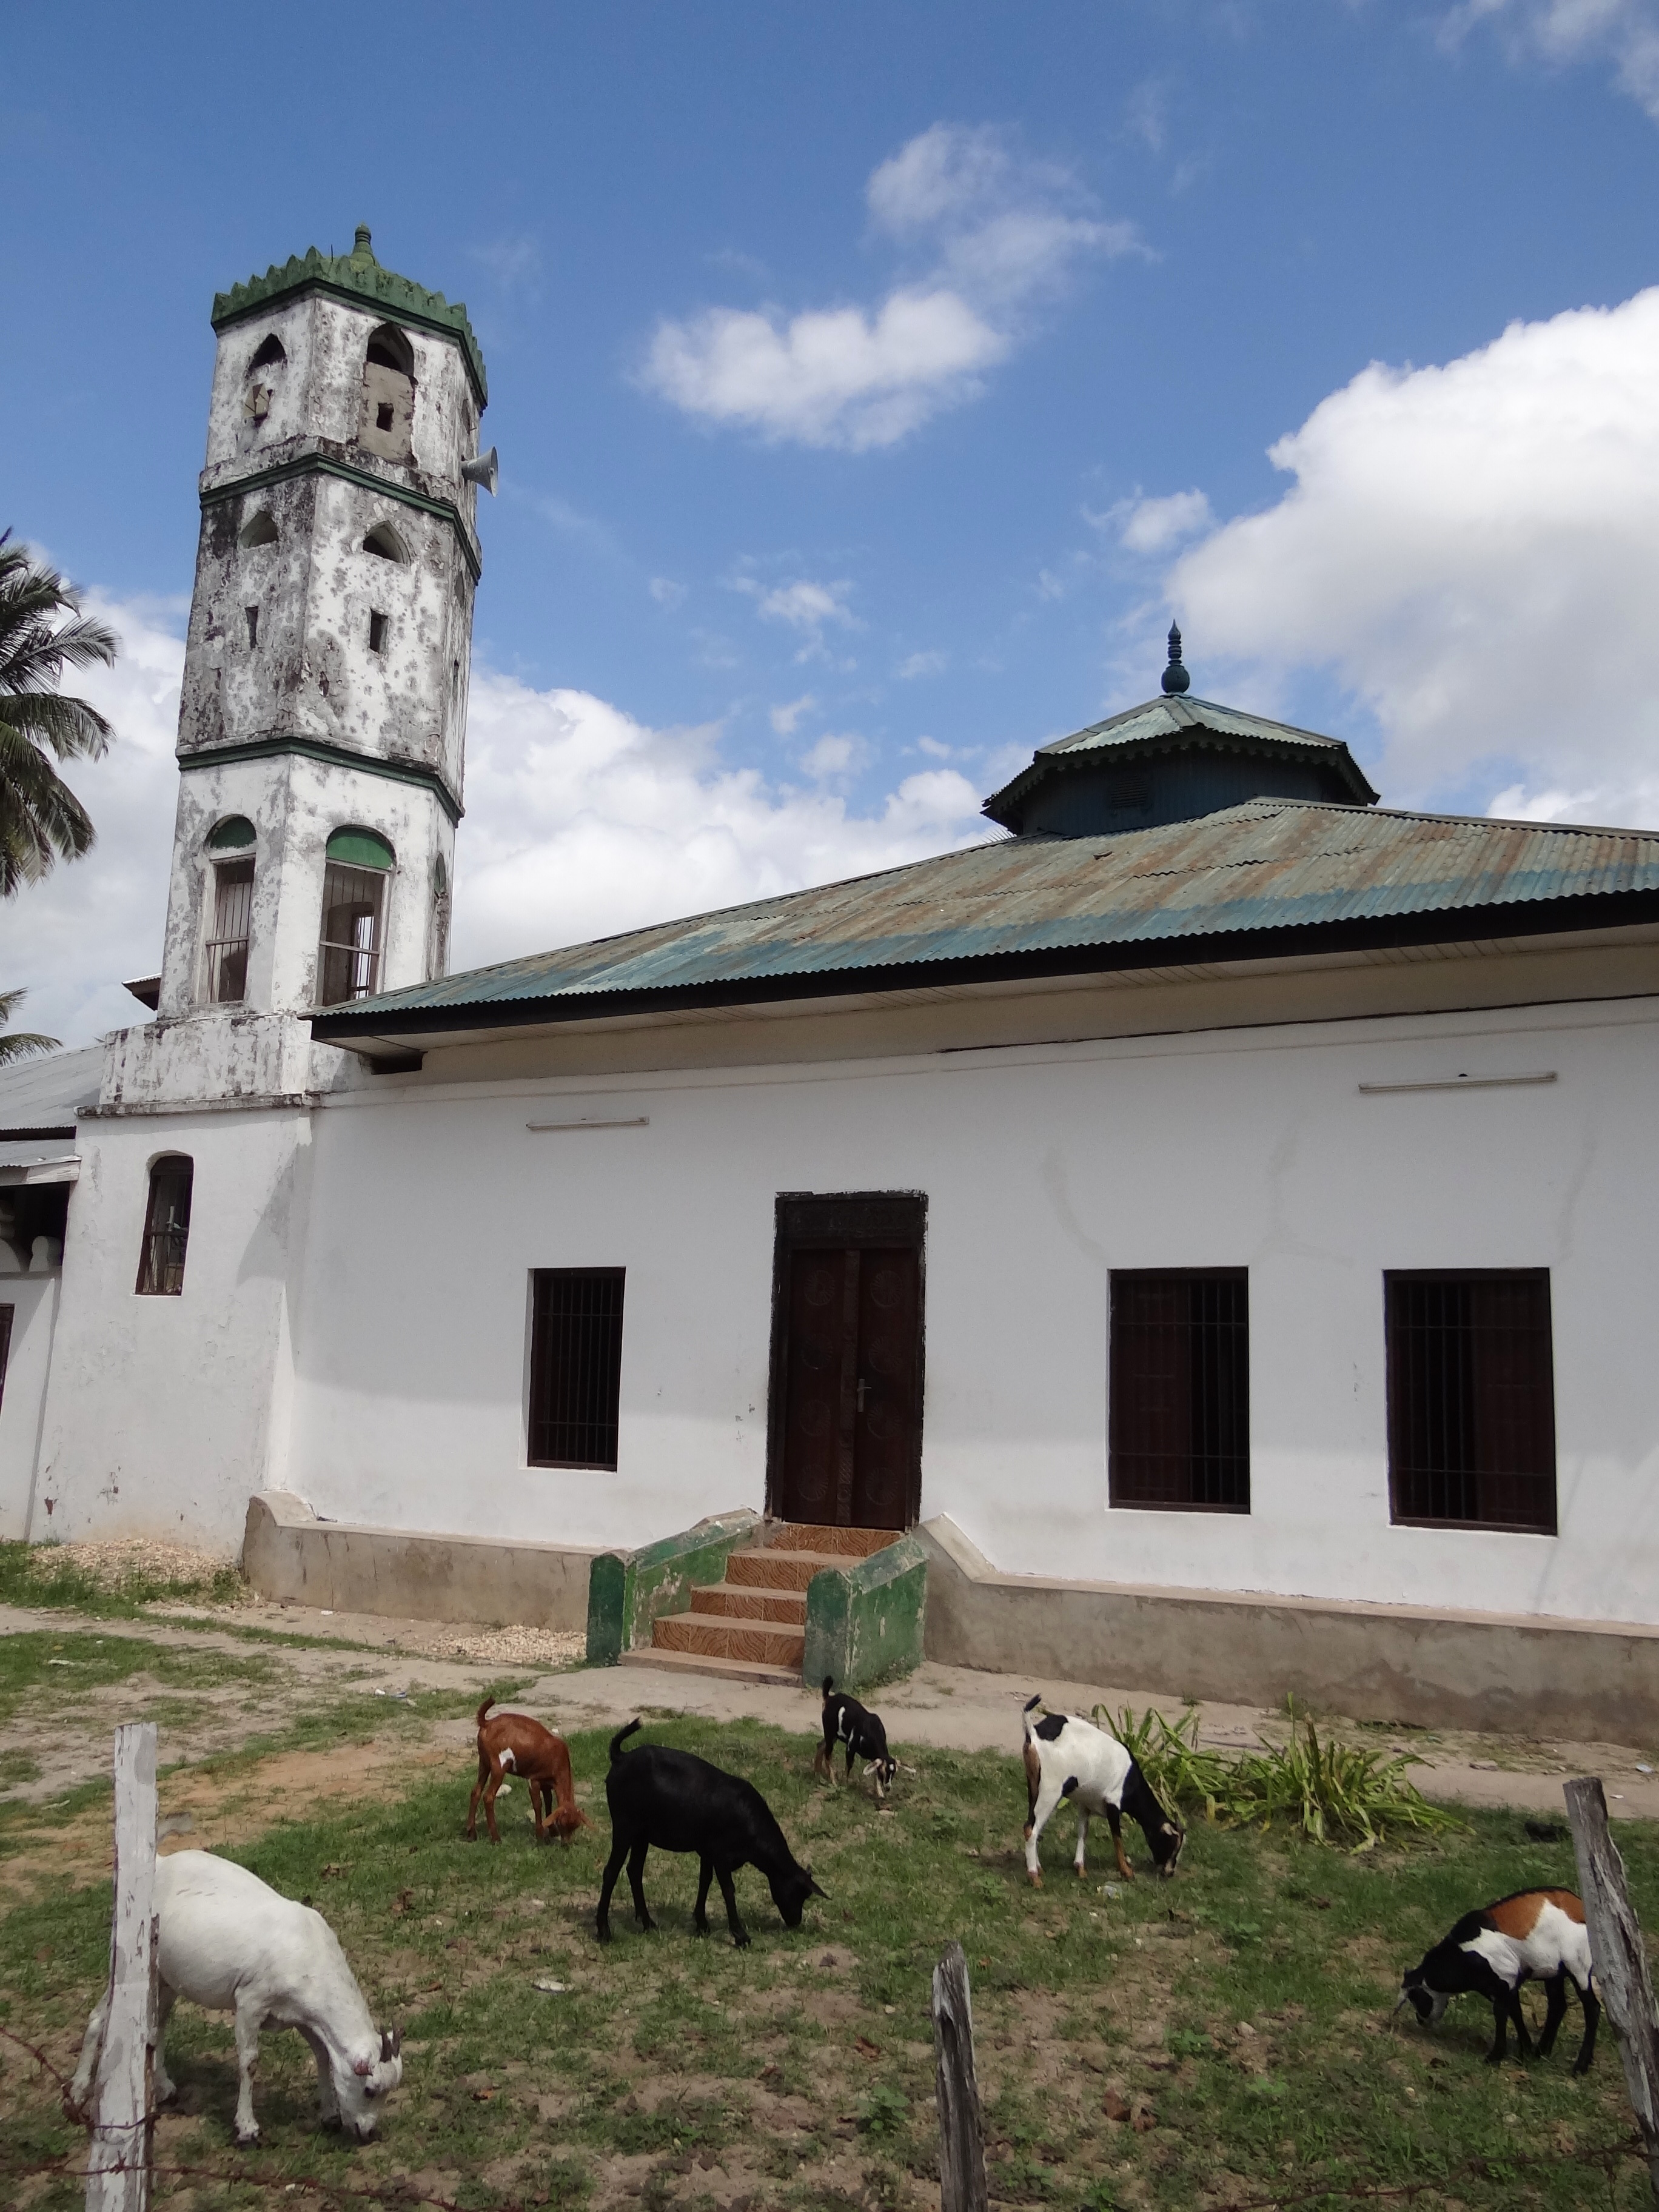 Bagamoyo Tanzania  city photos gallery : Local Mosque Bagamoyo Tanzania Wikimedia Commons